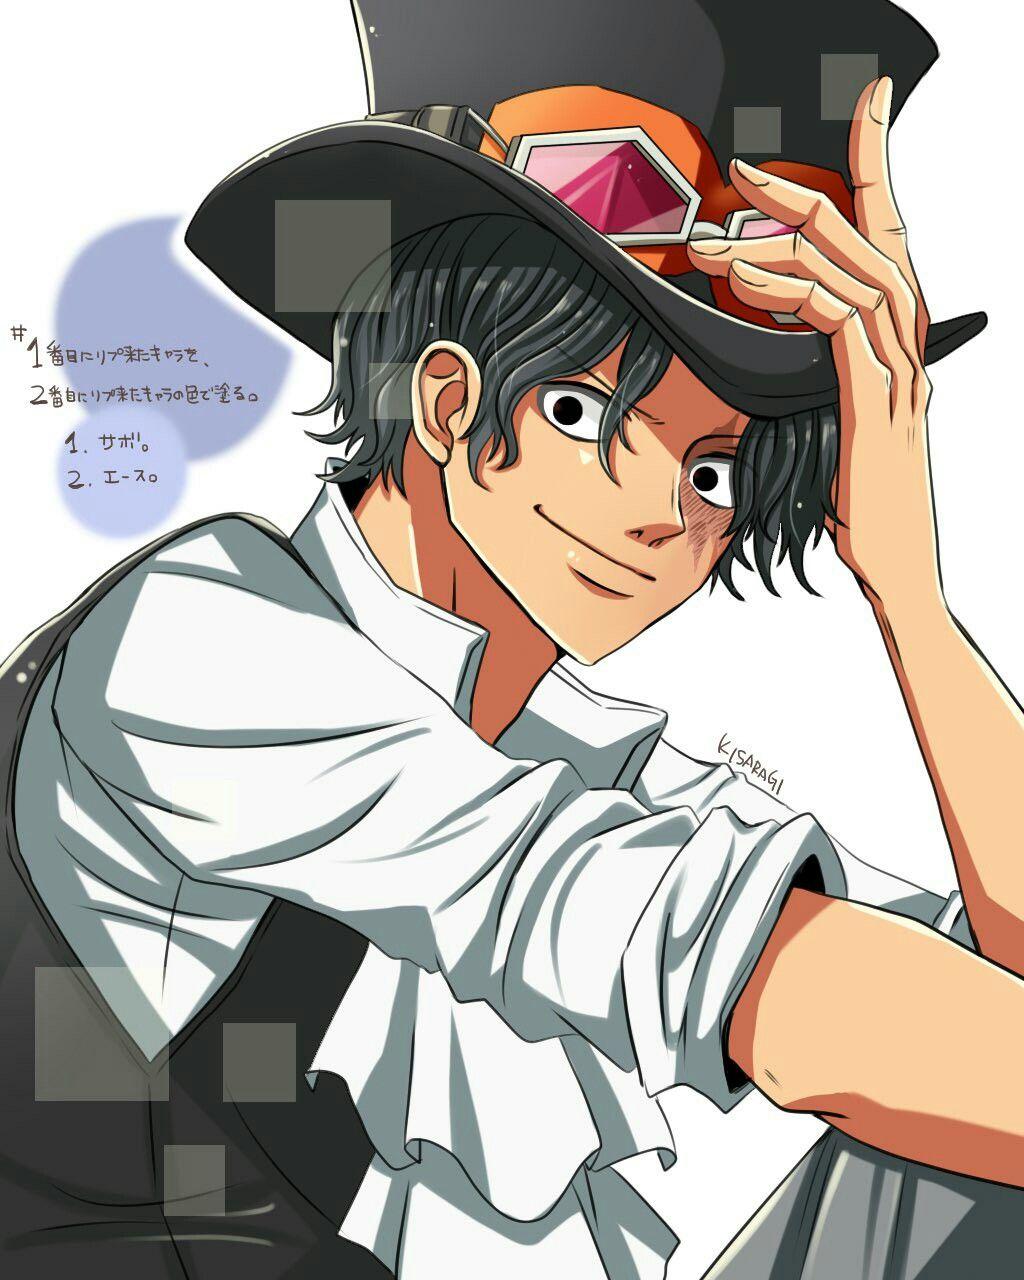 Sabo With Black Hair One Piece Ace Sabo One Piece One Piece Anime